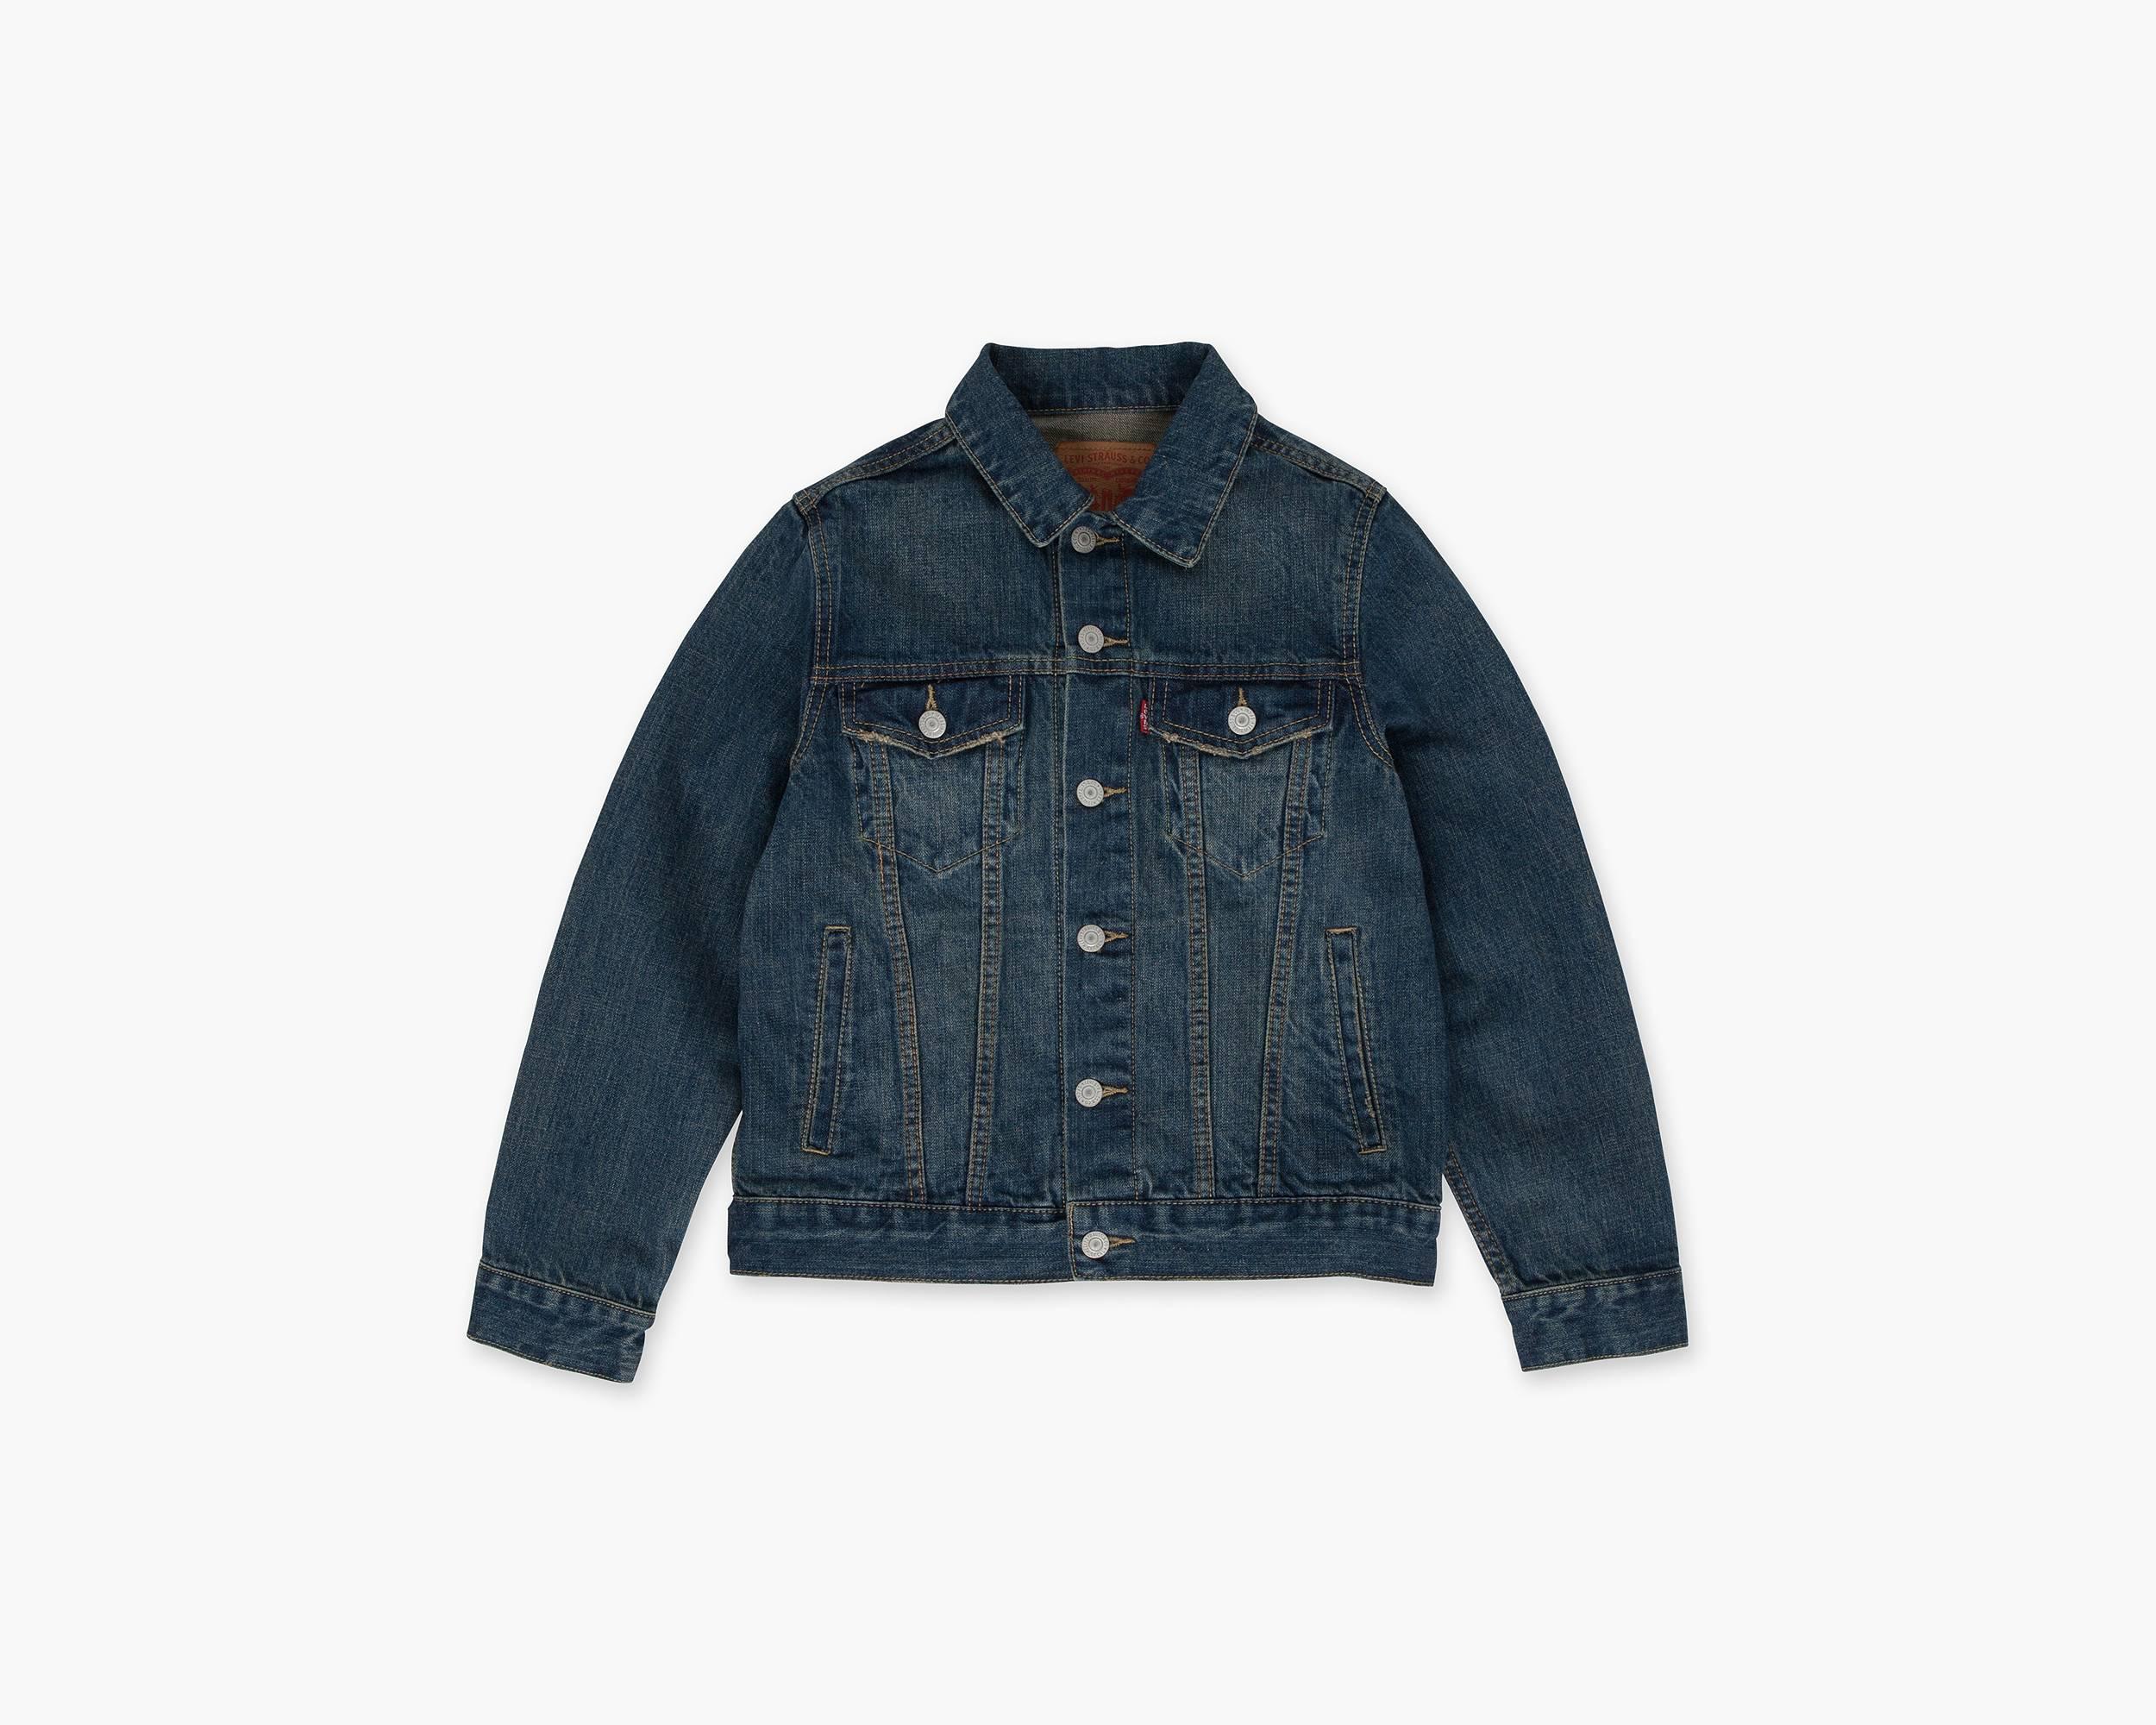 Boys Jean Jackets &amp Denim Vests - Boys Outerwear | Levi&39s®